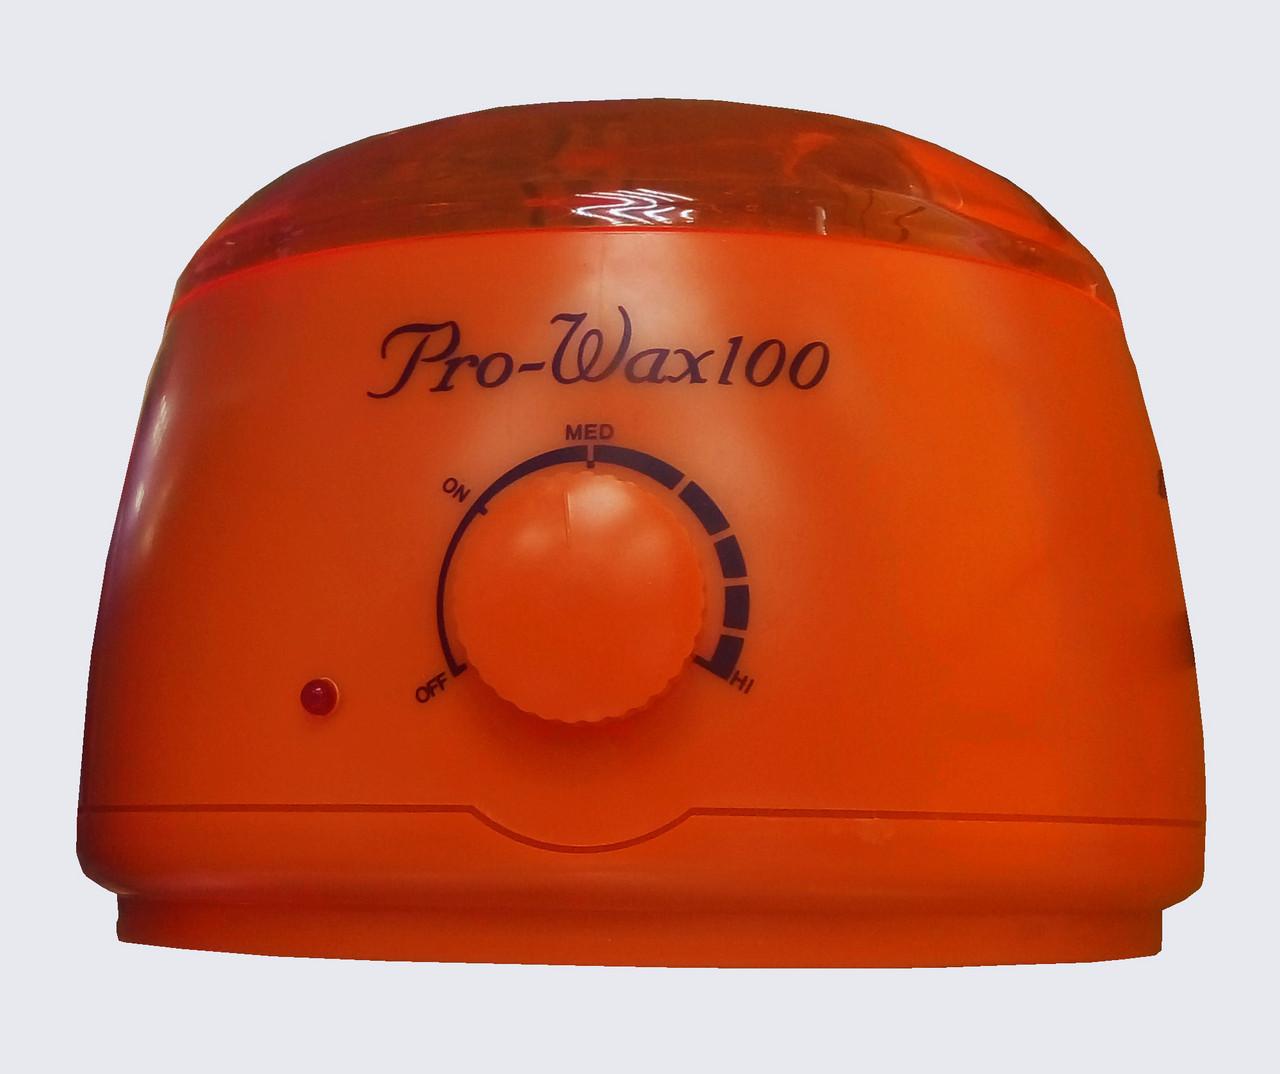 Воскоплав Pro Wax 100 на 400 мл для воска и парафина с регулятором температуры